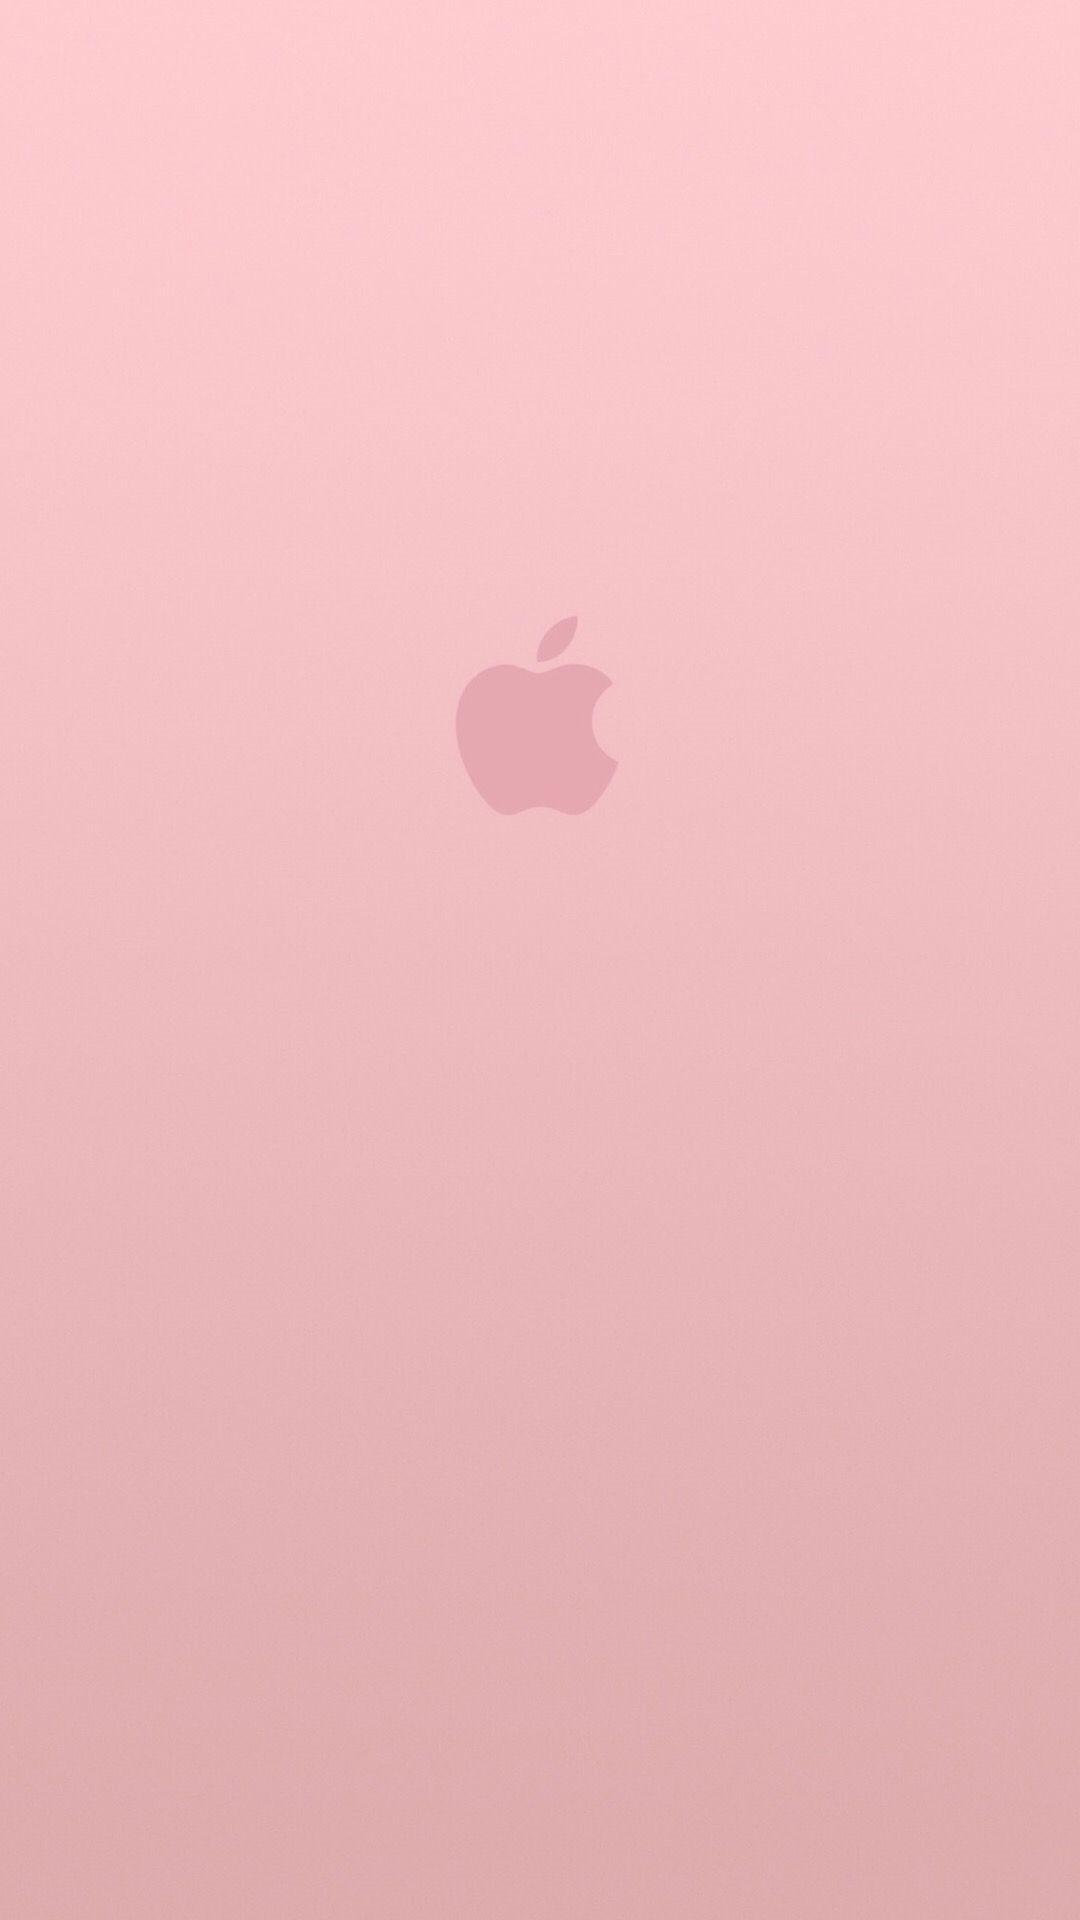 Light Pink iphone 8 plus wallpaper